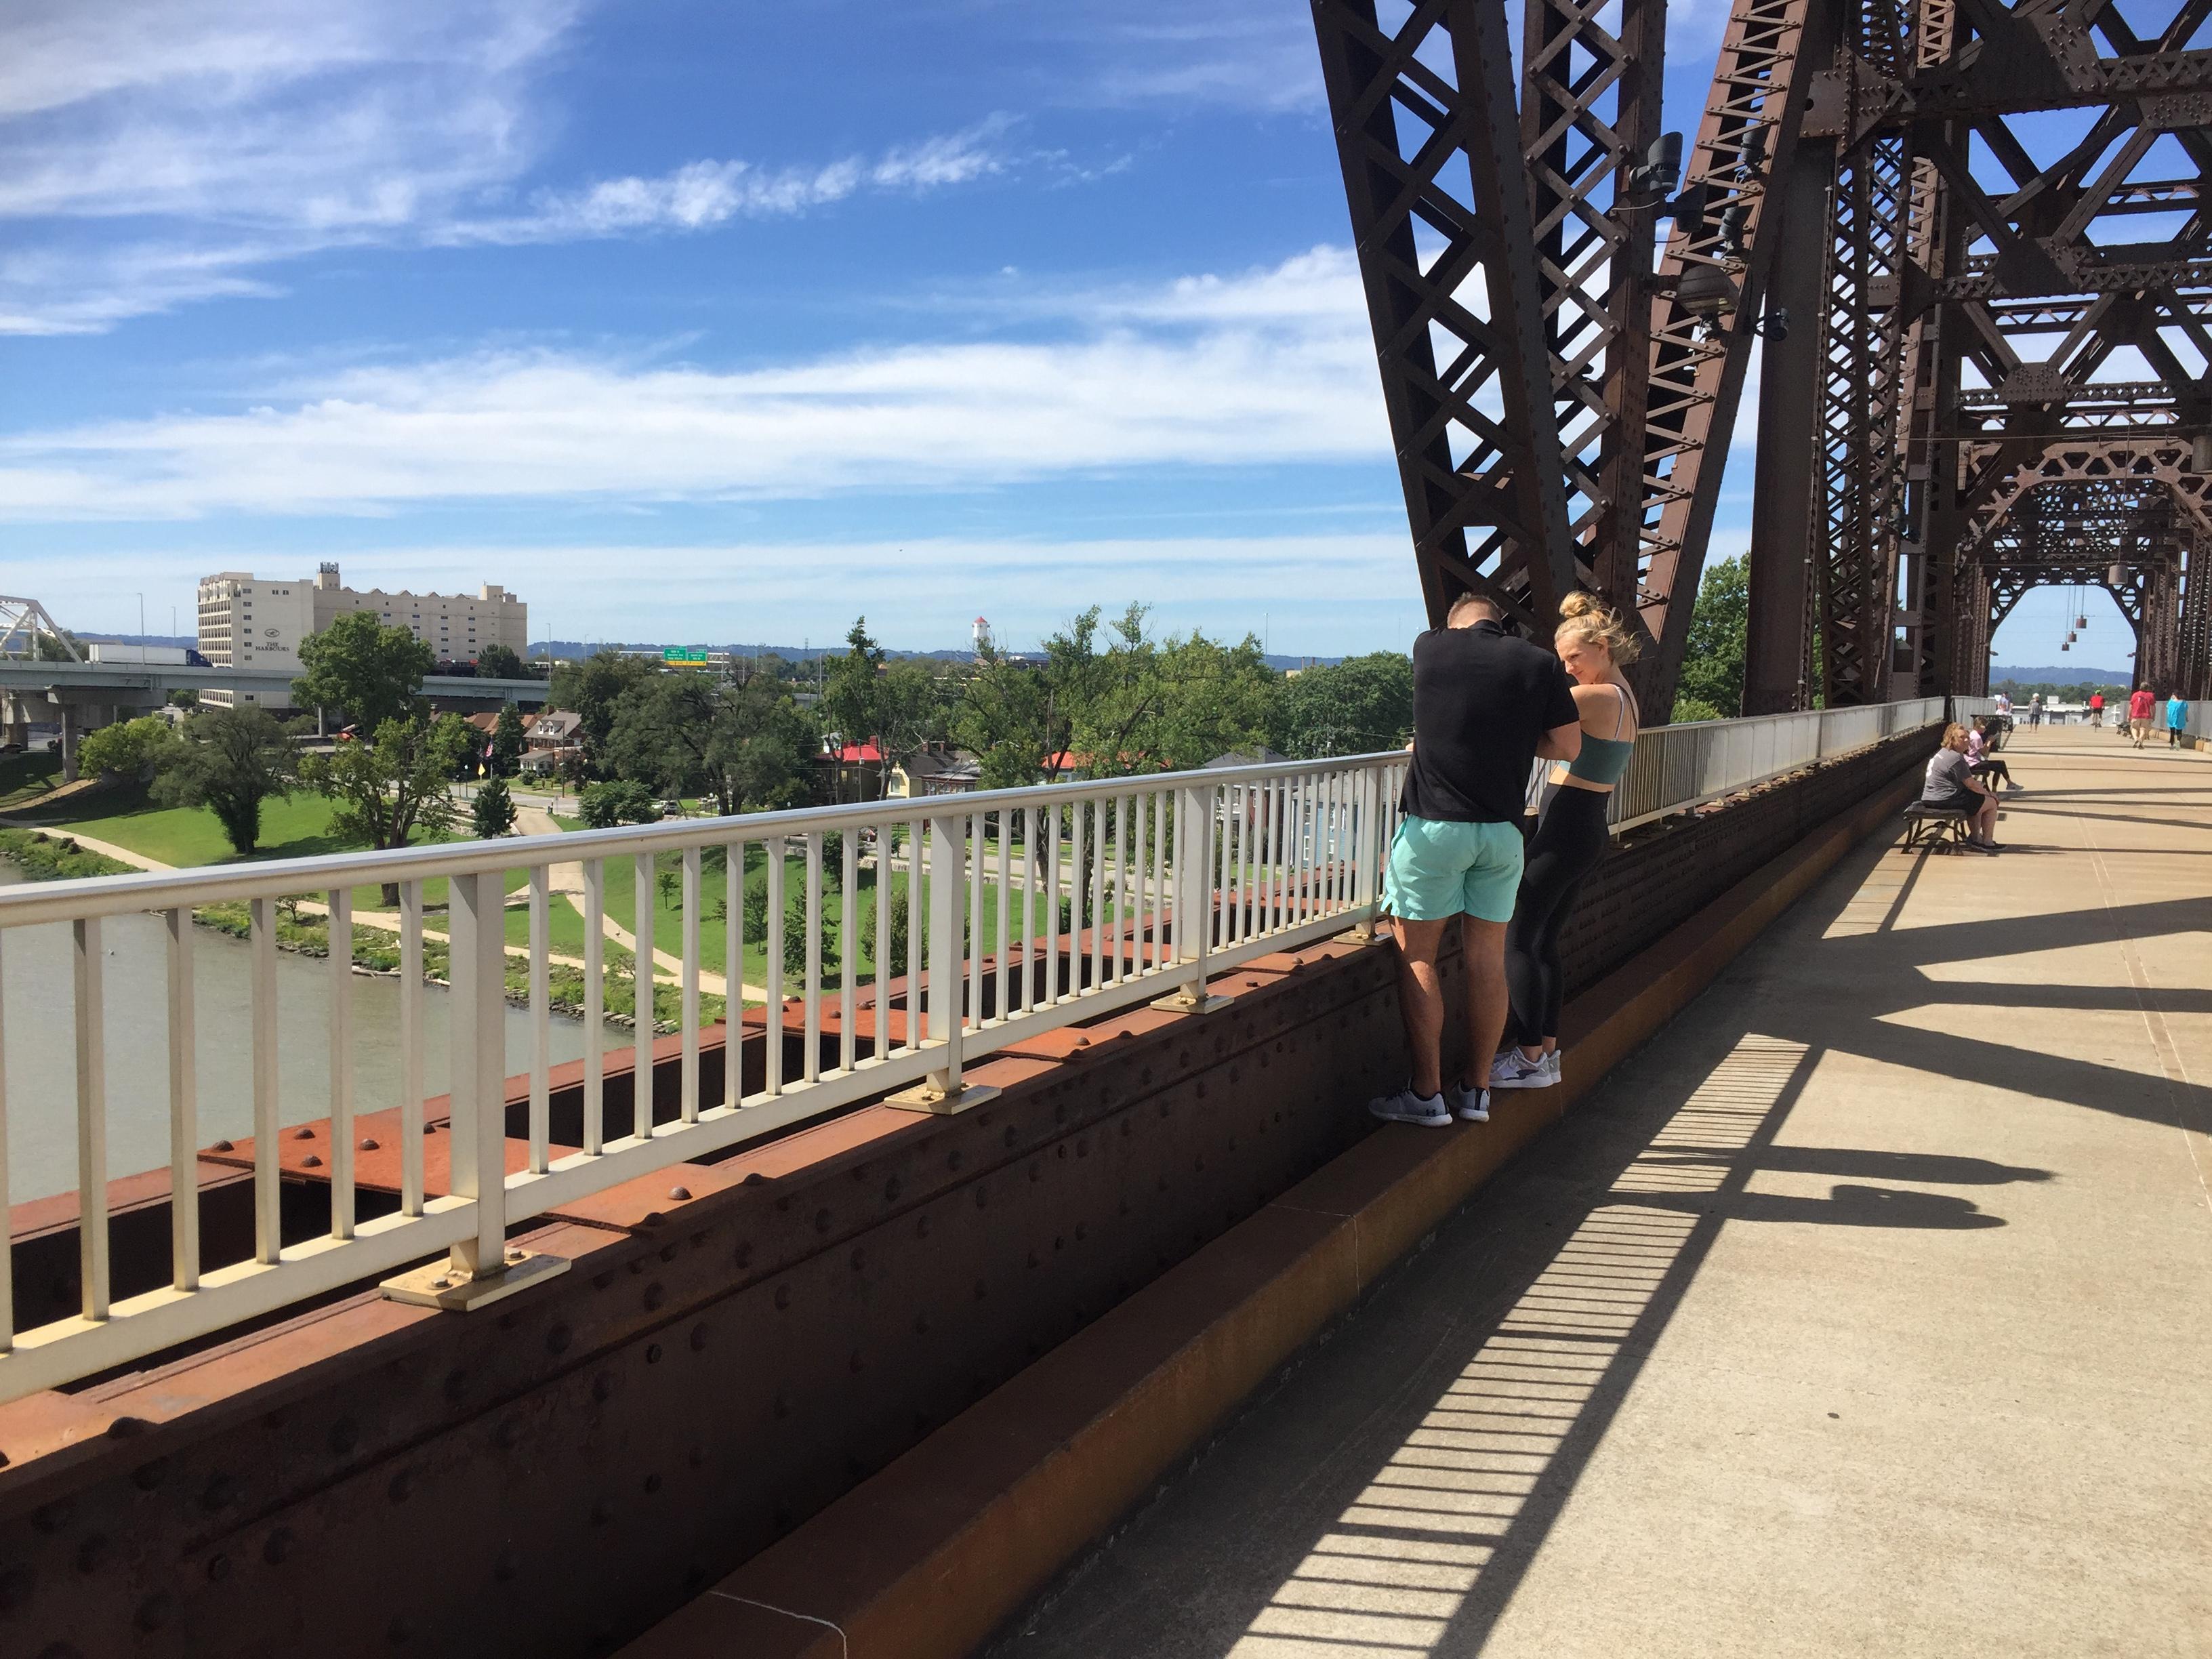 Big Four Bridge crossing the Ohio River in Jeffersonville